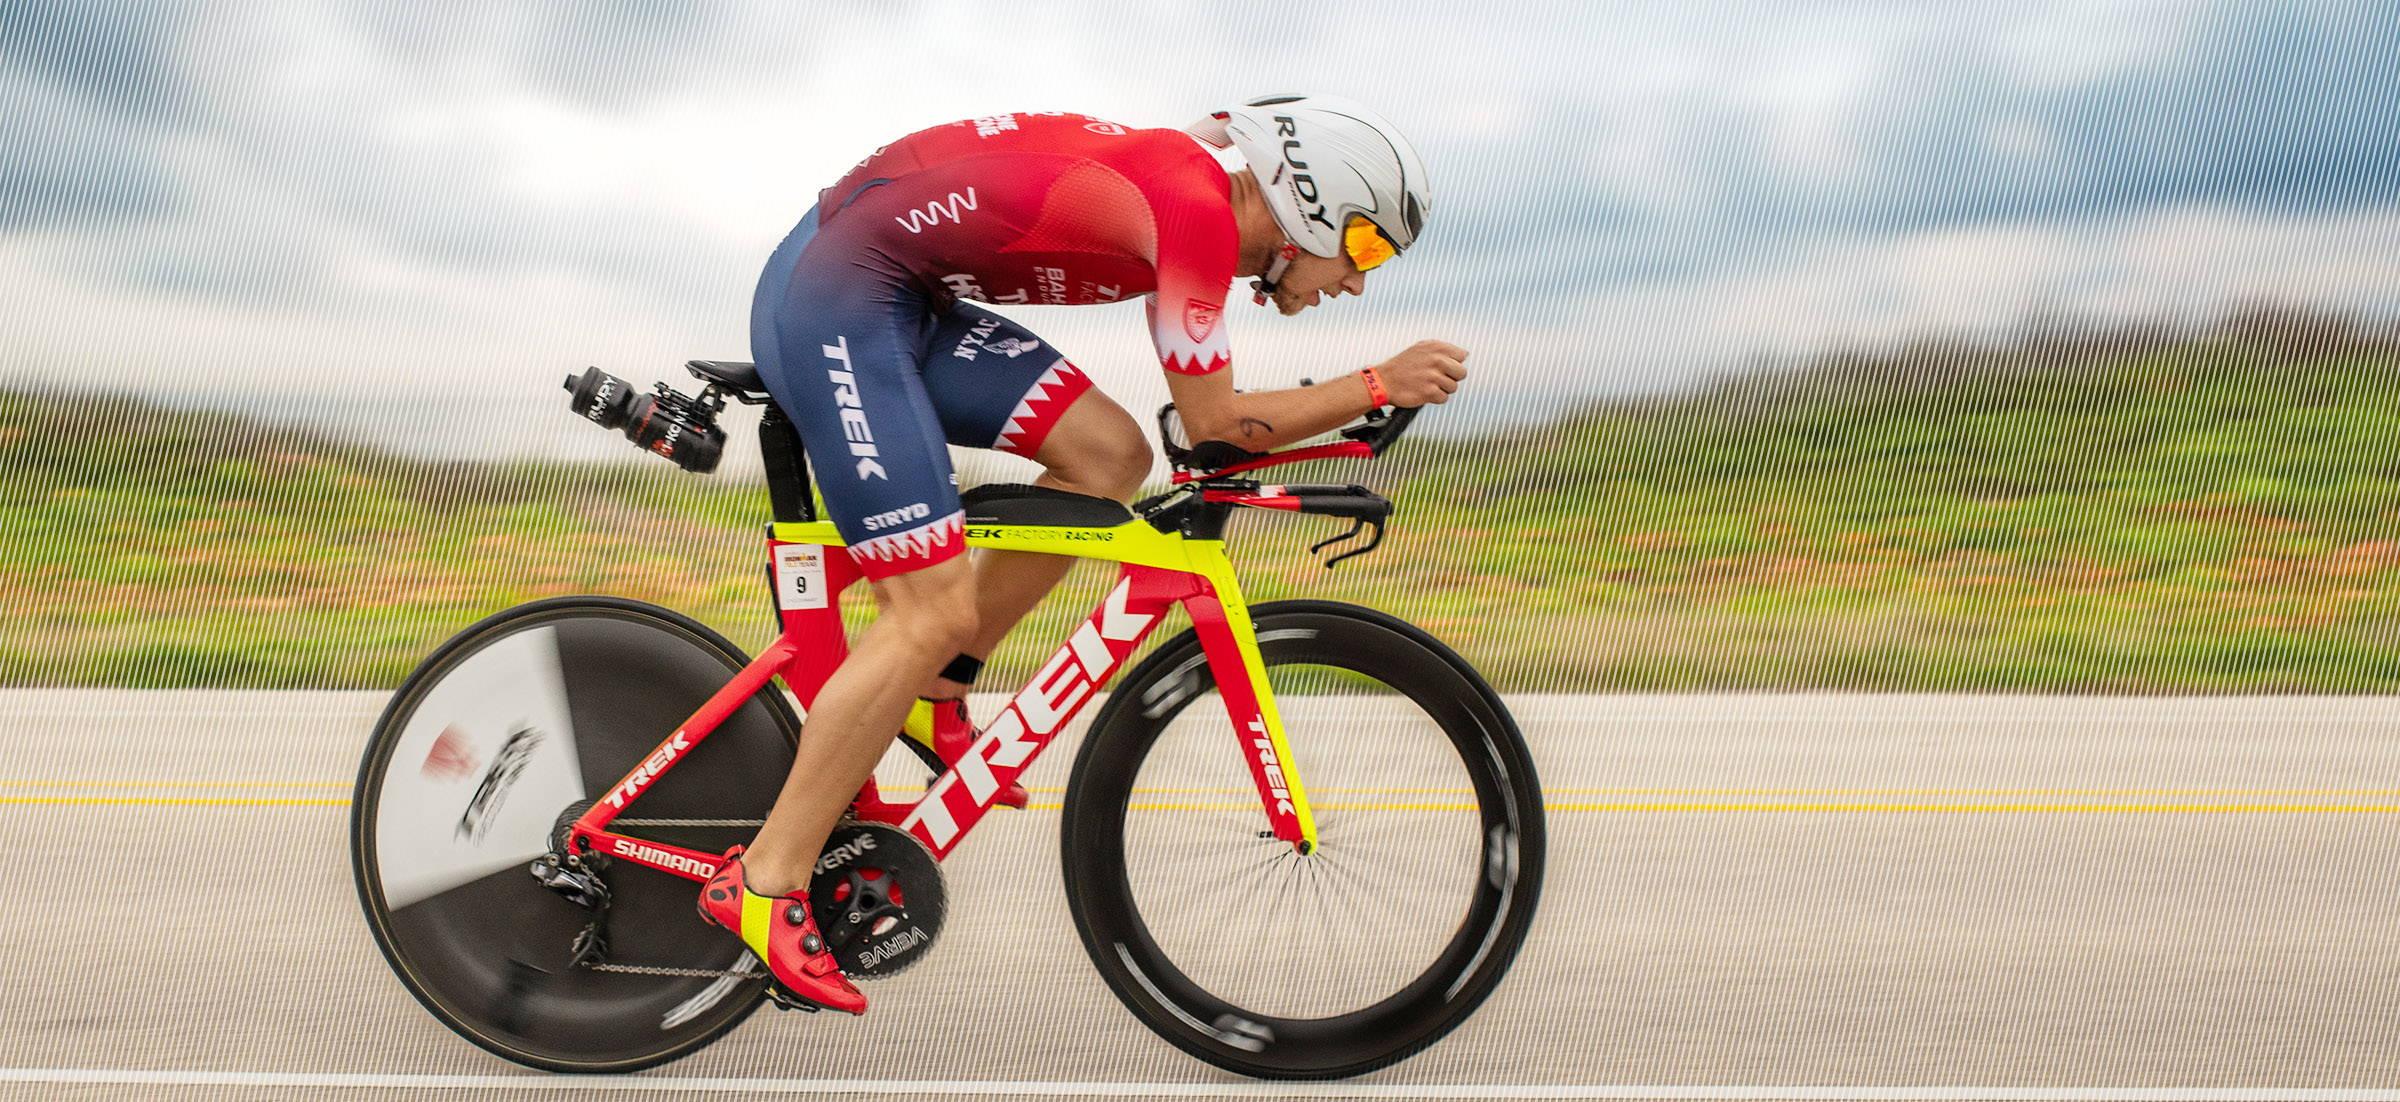 Red Triathlon Sunglasses Black Bike Cycling Aero Helmet Sun Glasses Cyclocross